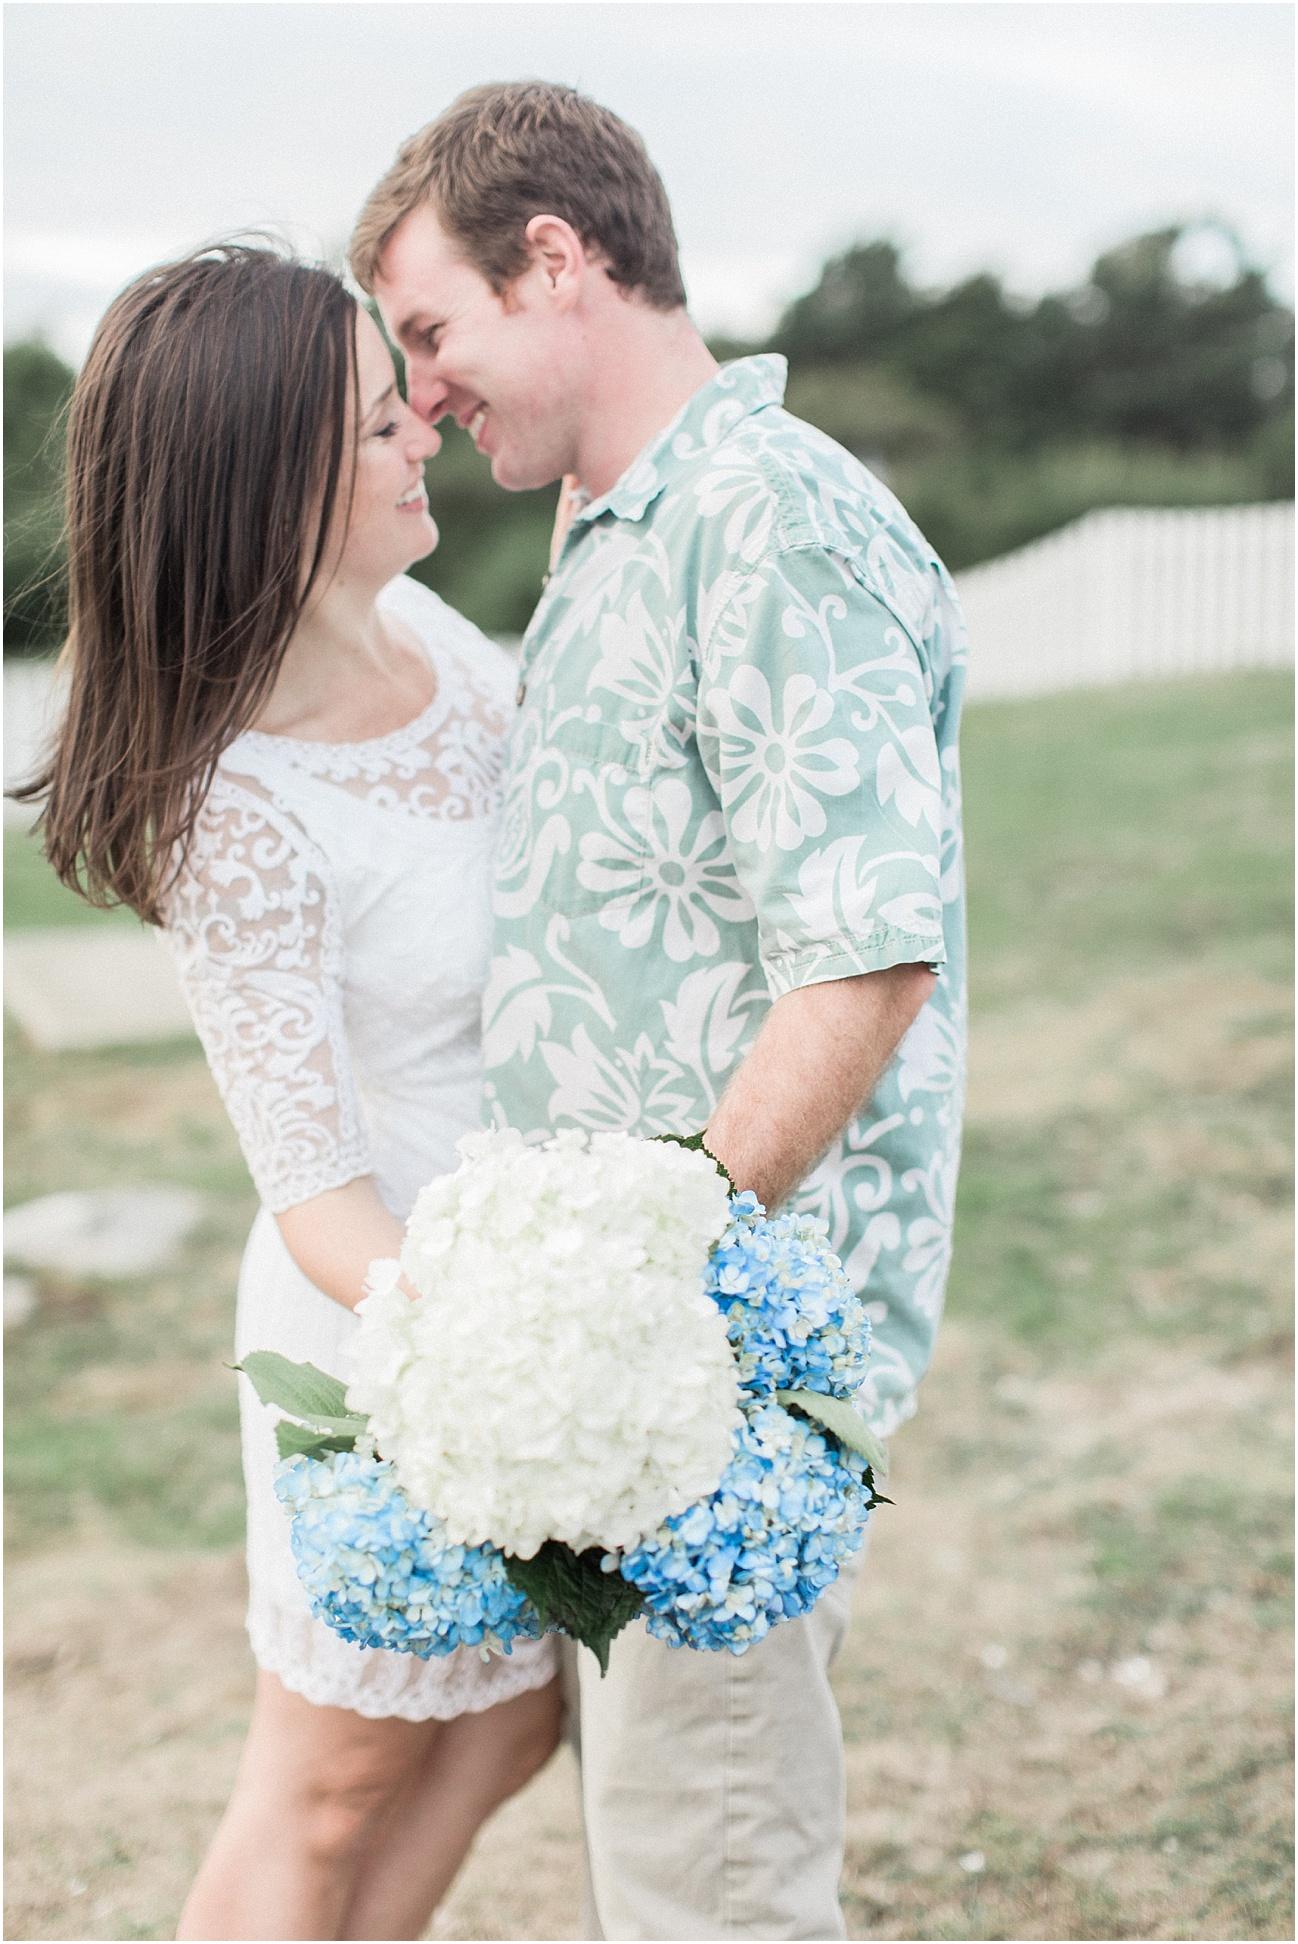 rosie_ryan_nobska_light_house_engagement_cape_cod_boston_wedding_photographer_meredith_jane_photography_photo_1082.jpg